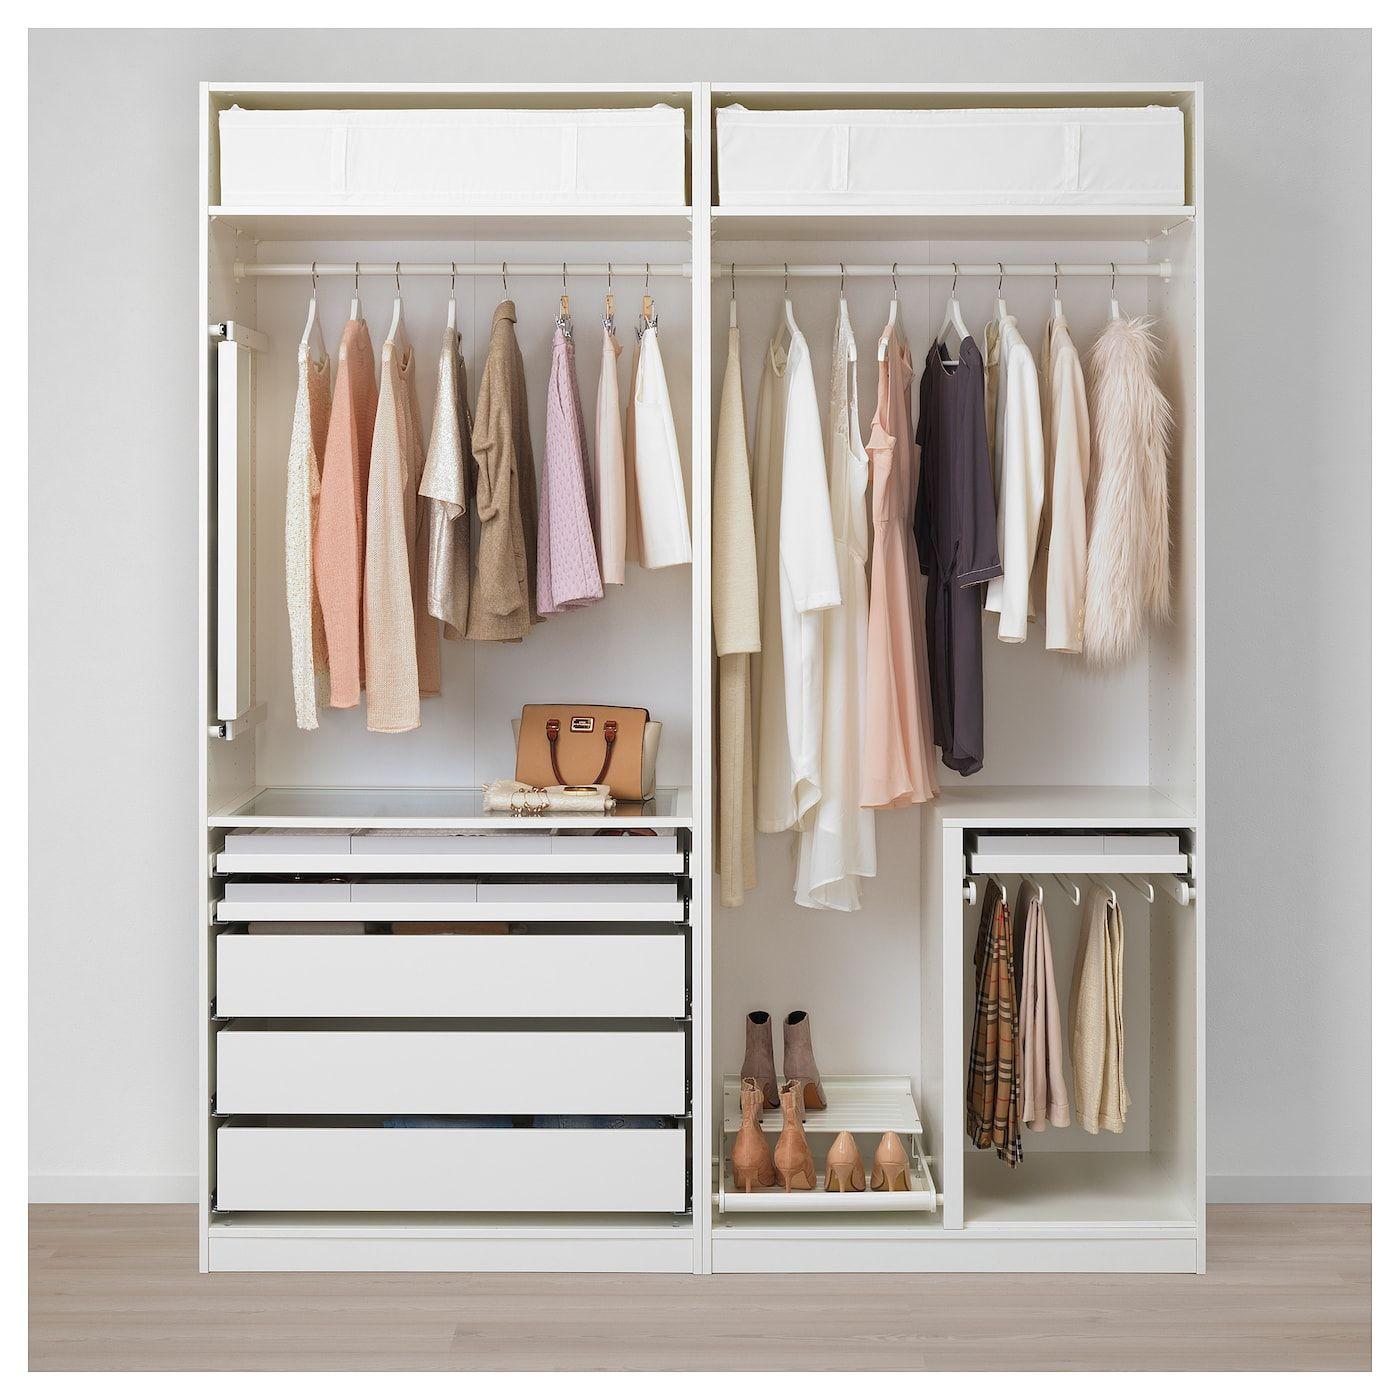 Ikea Pax Wardrobe White Hokksund High Gloss Light Beige Spalne Skrina